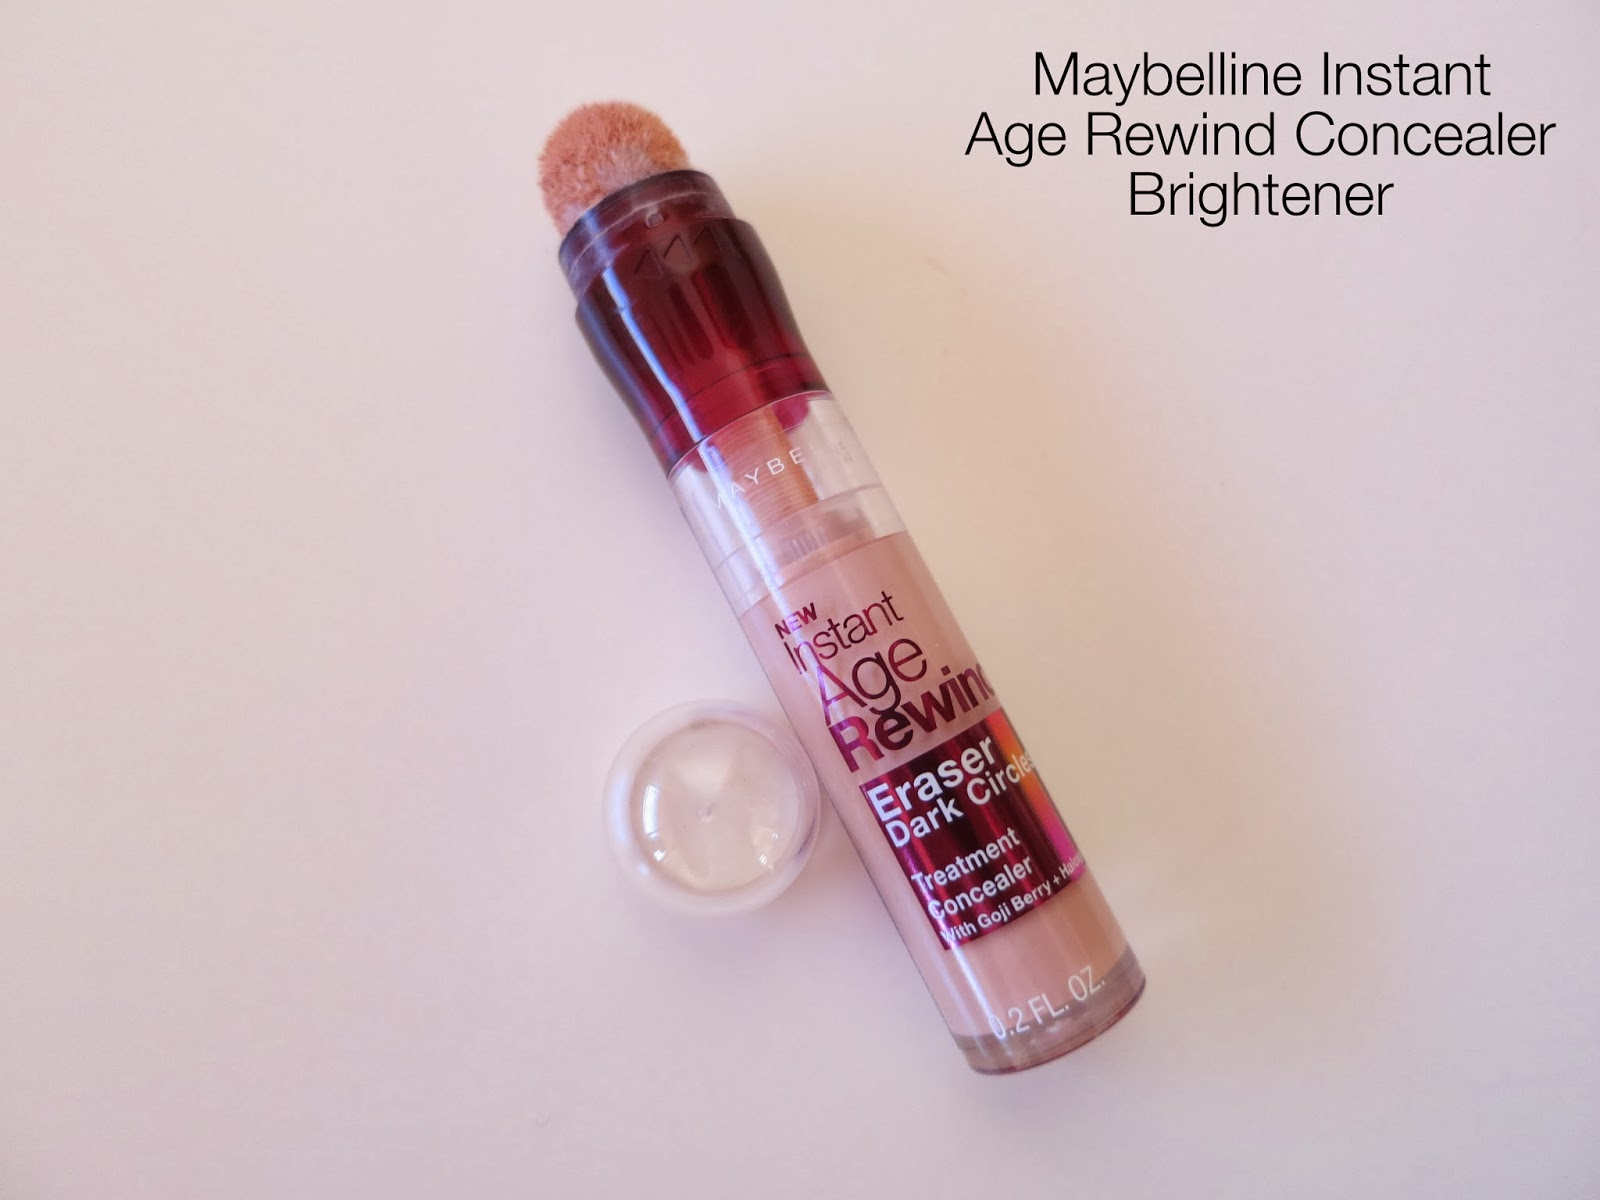 maybelline instant age rewind concealer, 5 best under eye concealers